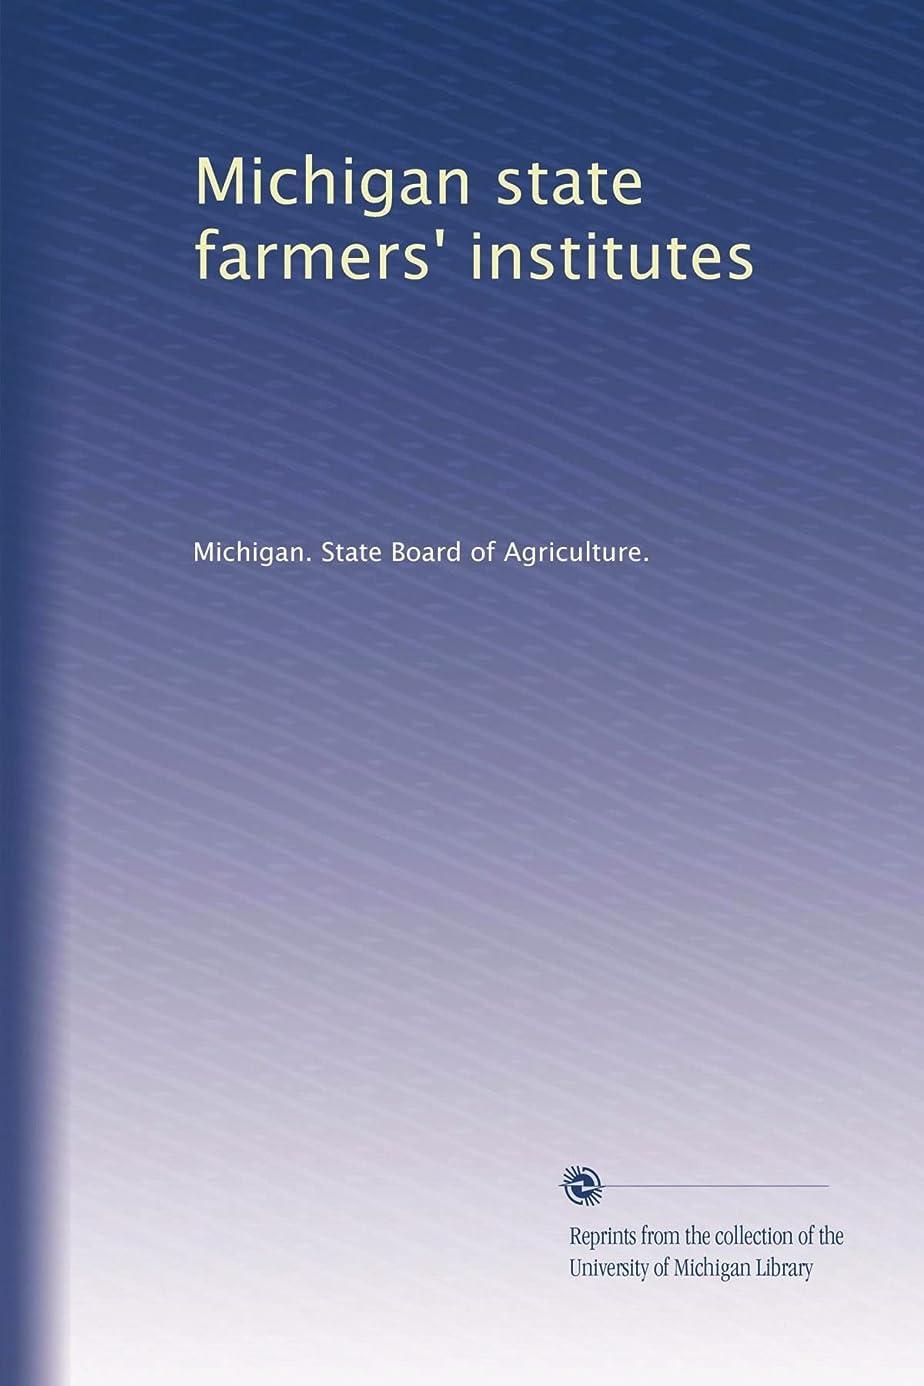 歯痛破産億Michigan state farmers' institutes (Vol.10)